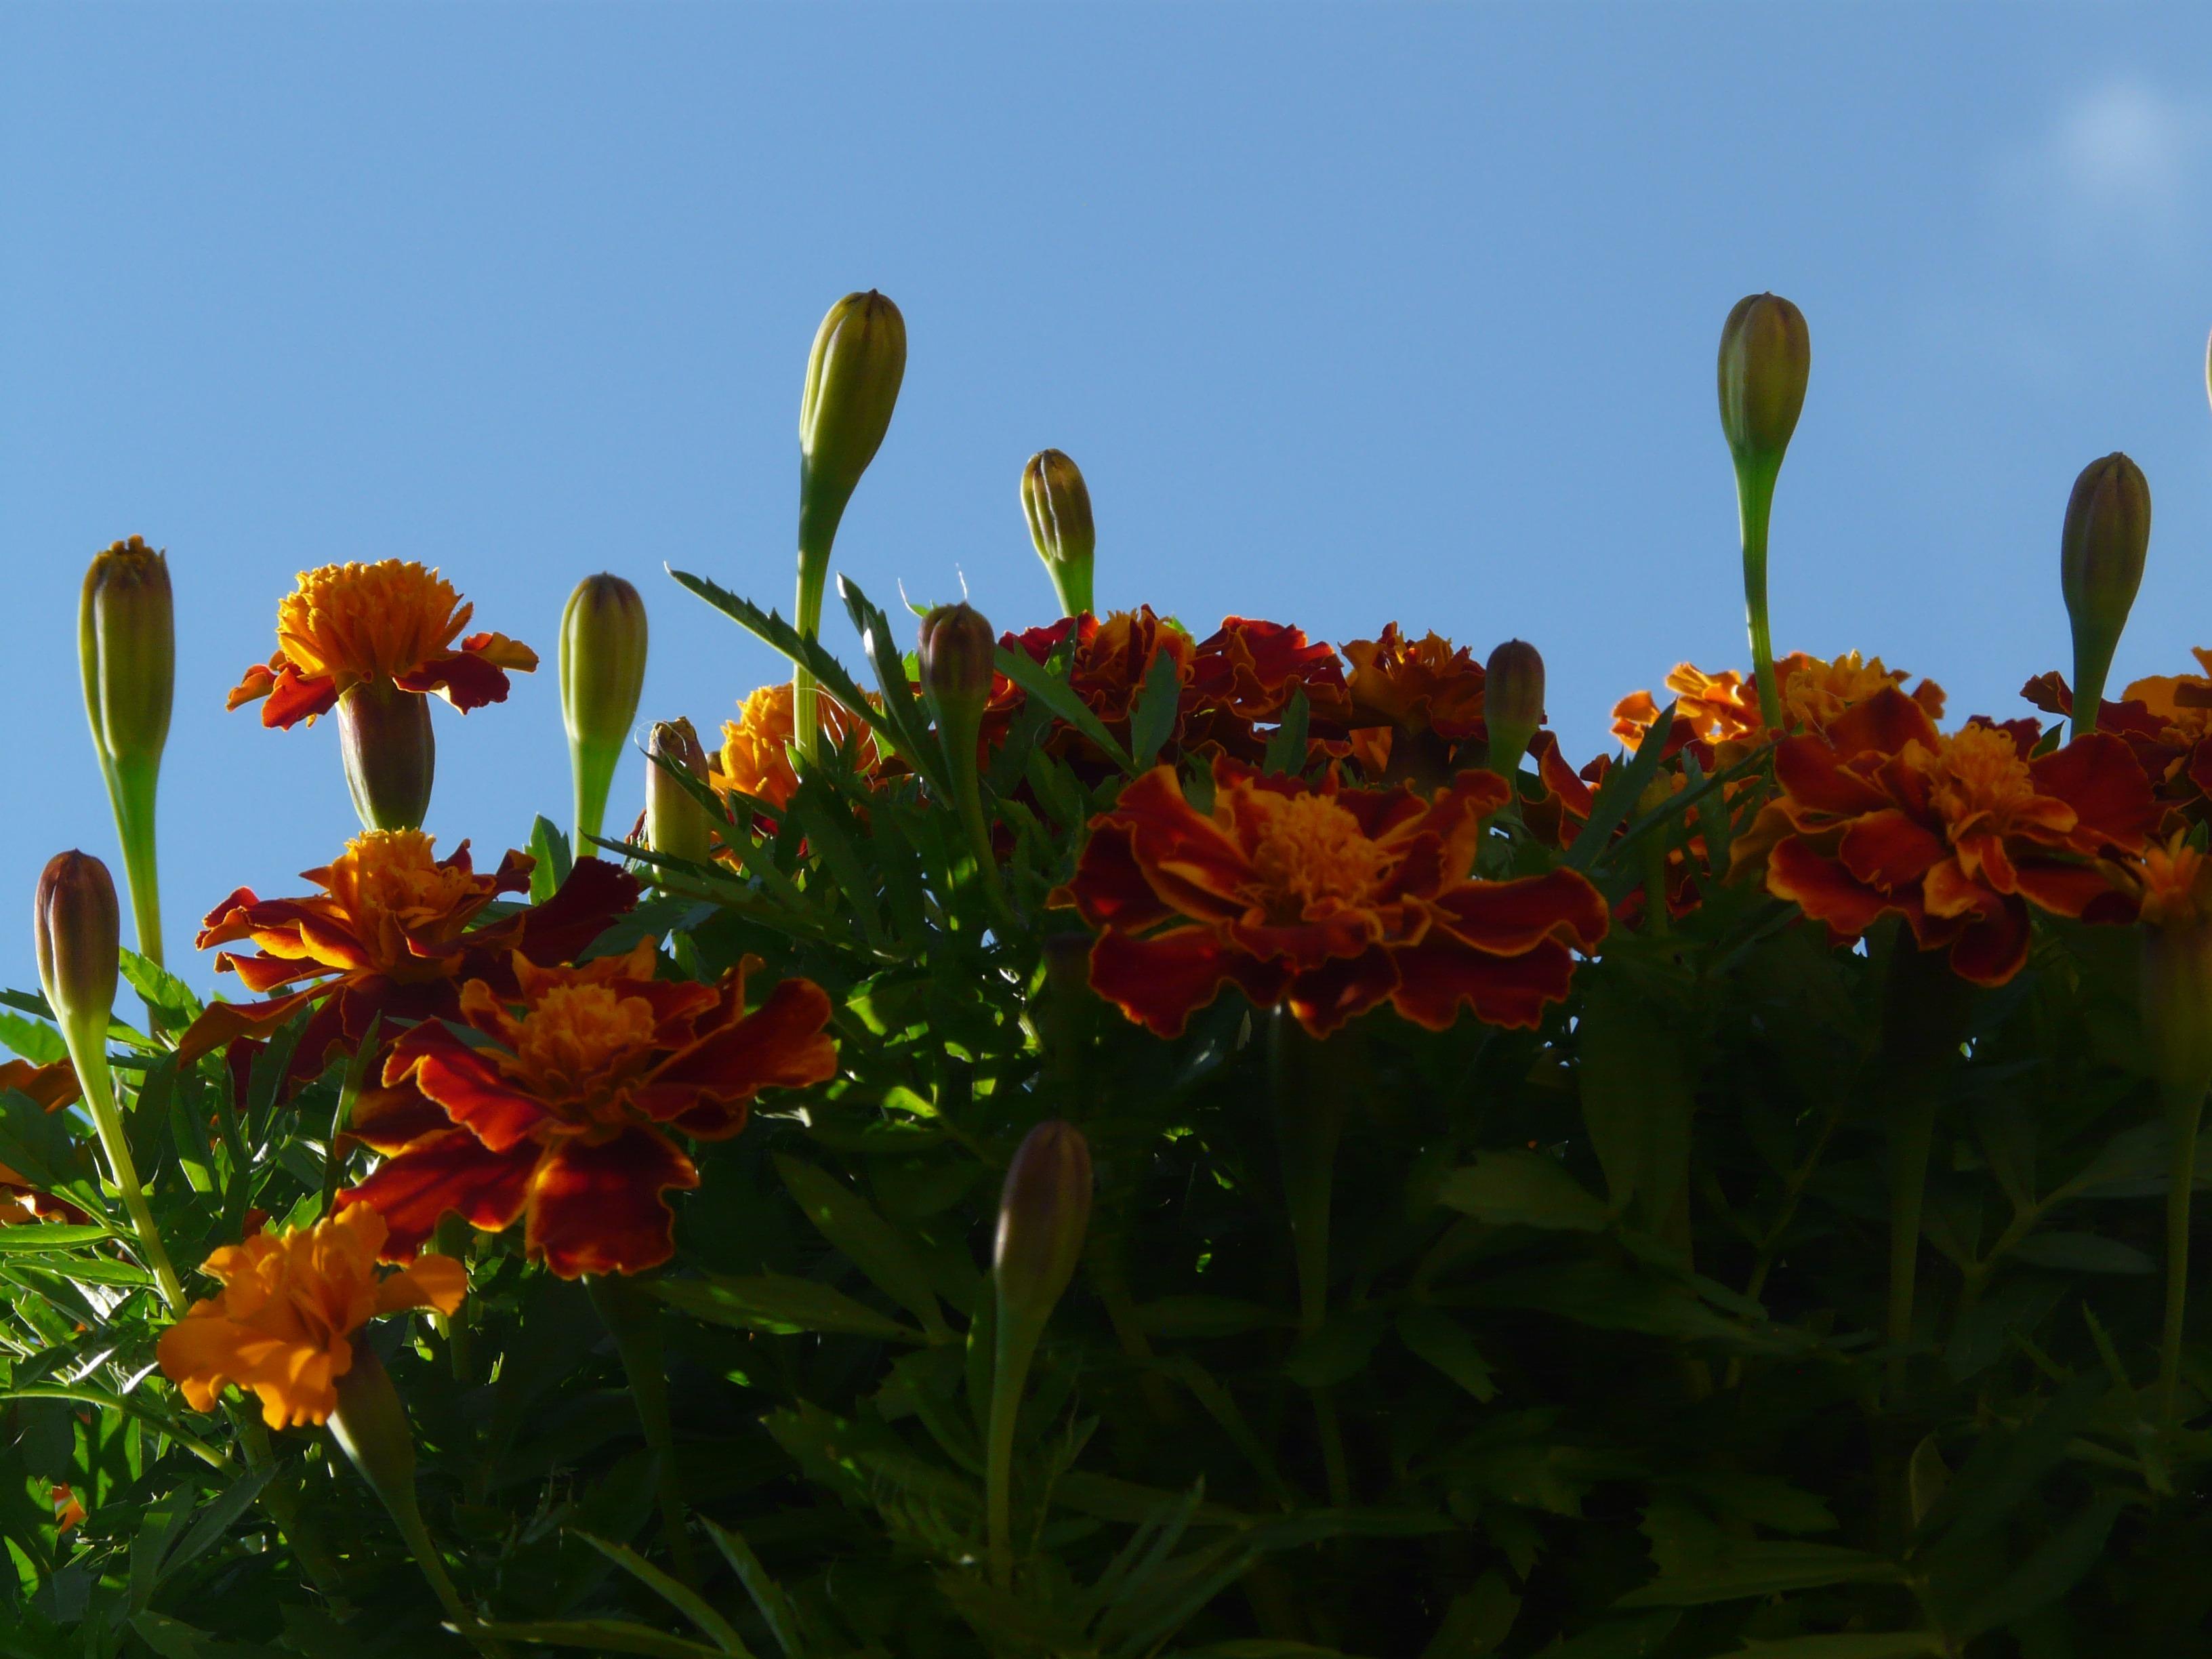 Free Images Nature Grass Blossom Field Meadow Prairie Leaf Petal Bloom Orange Red Botany Colorful Garden Flora Dead Flower Wildflower